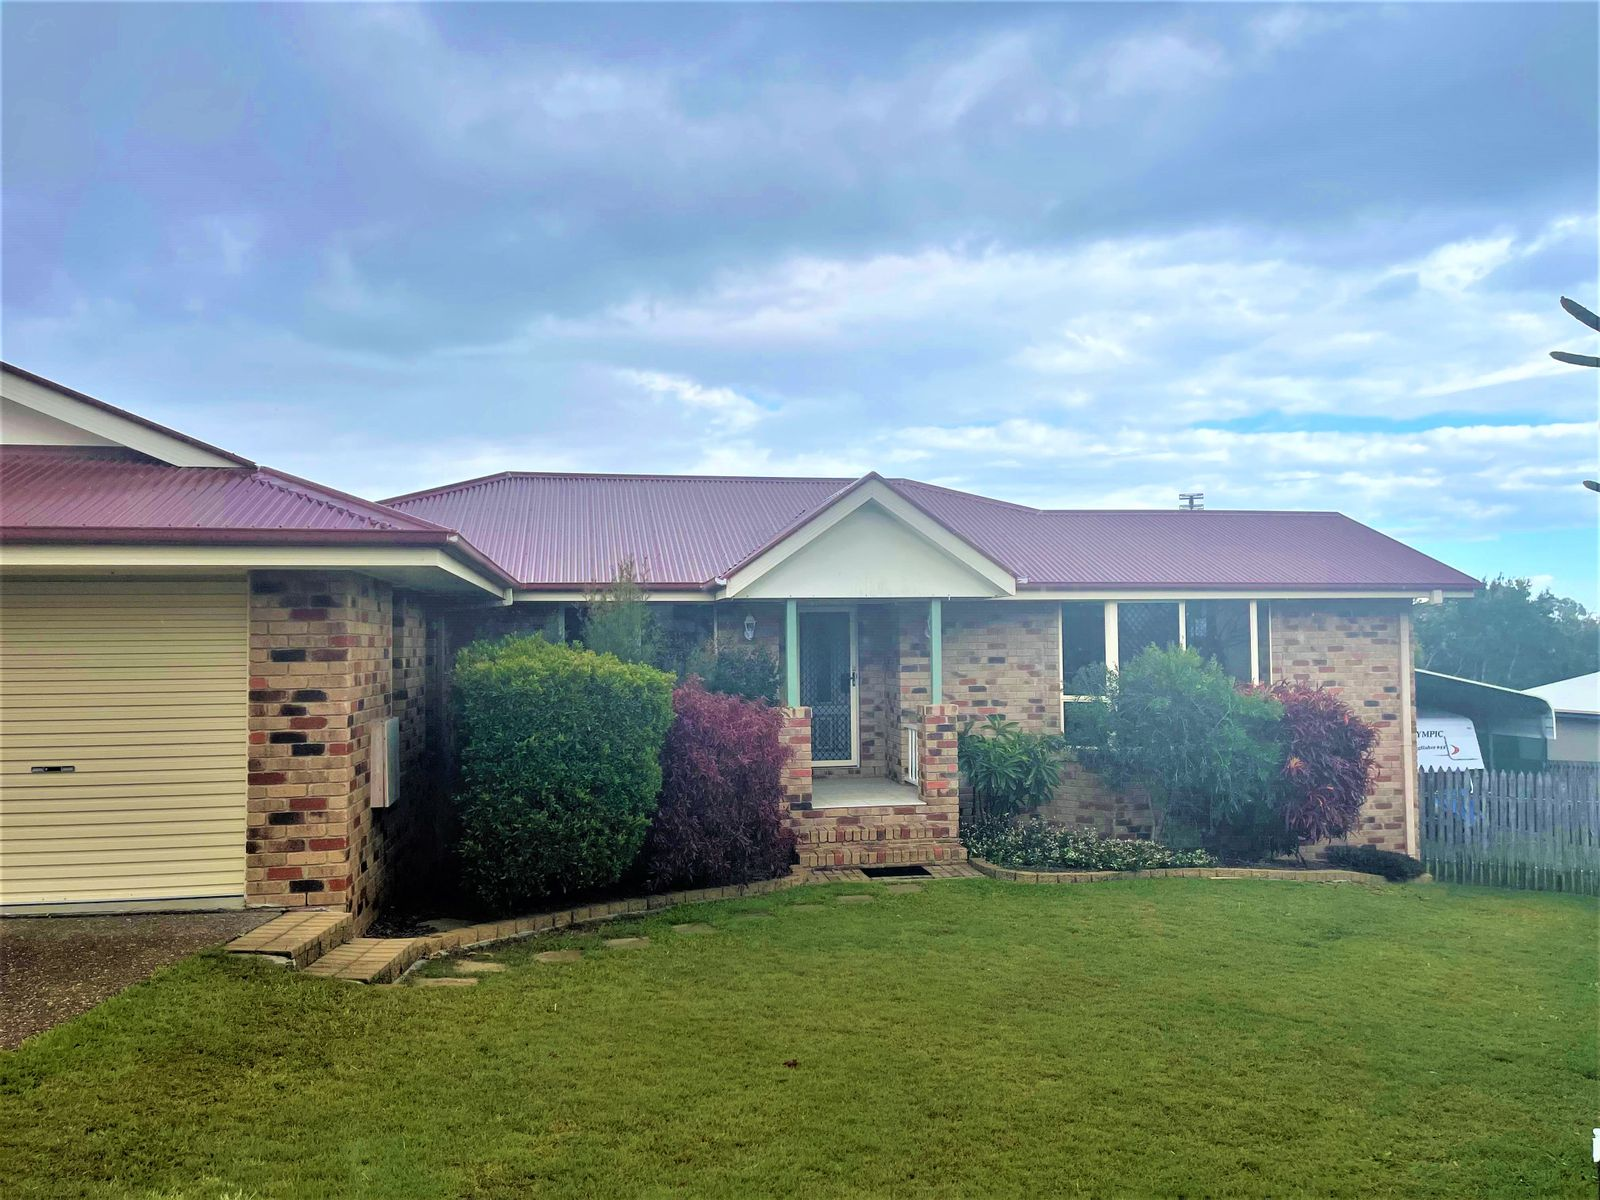 17 Lygon Court, Urraween, QLD 4655